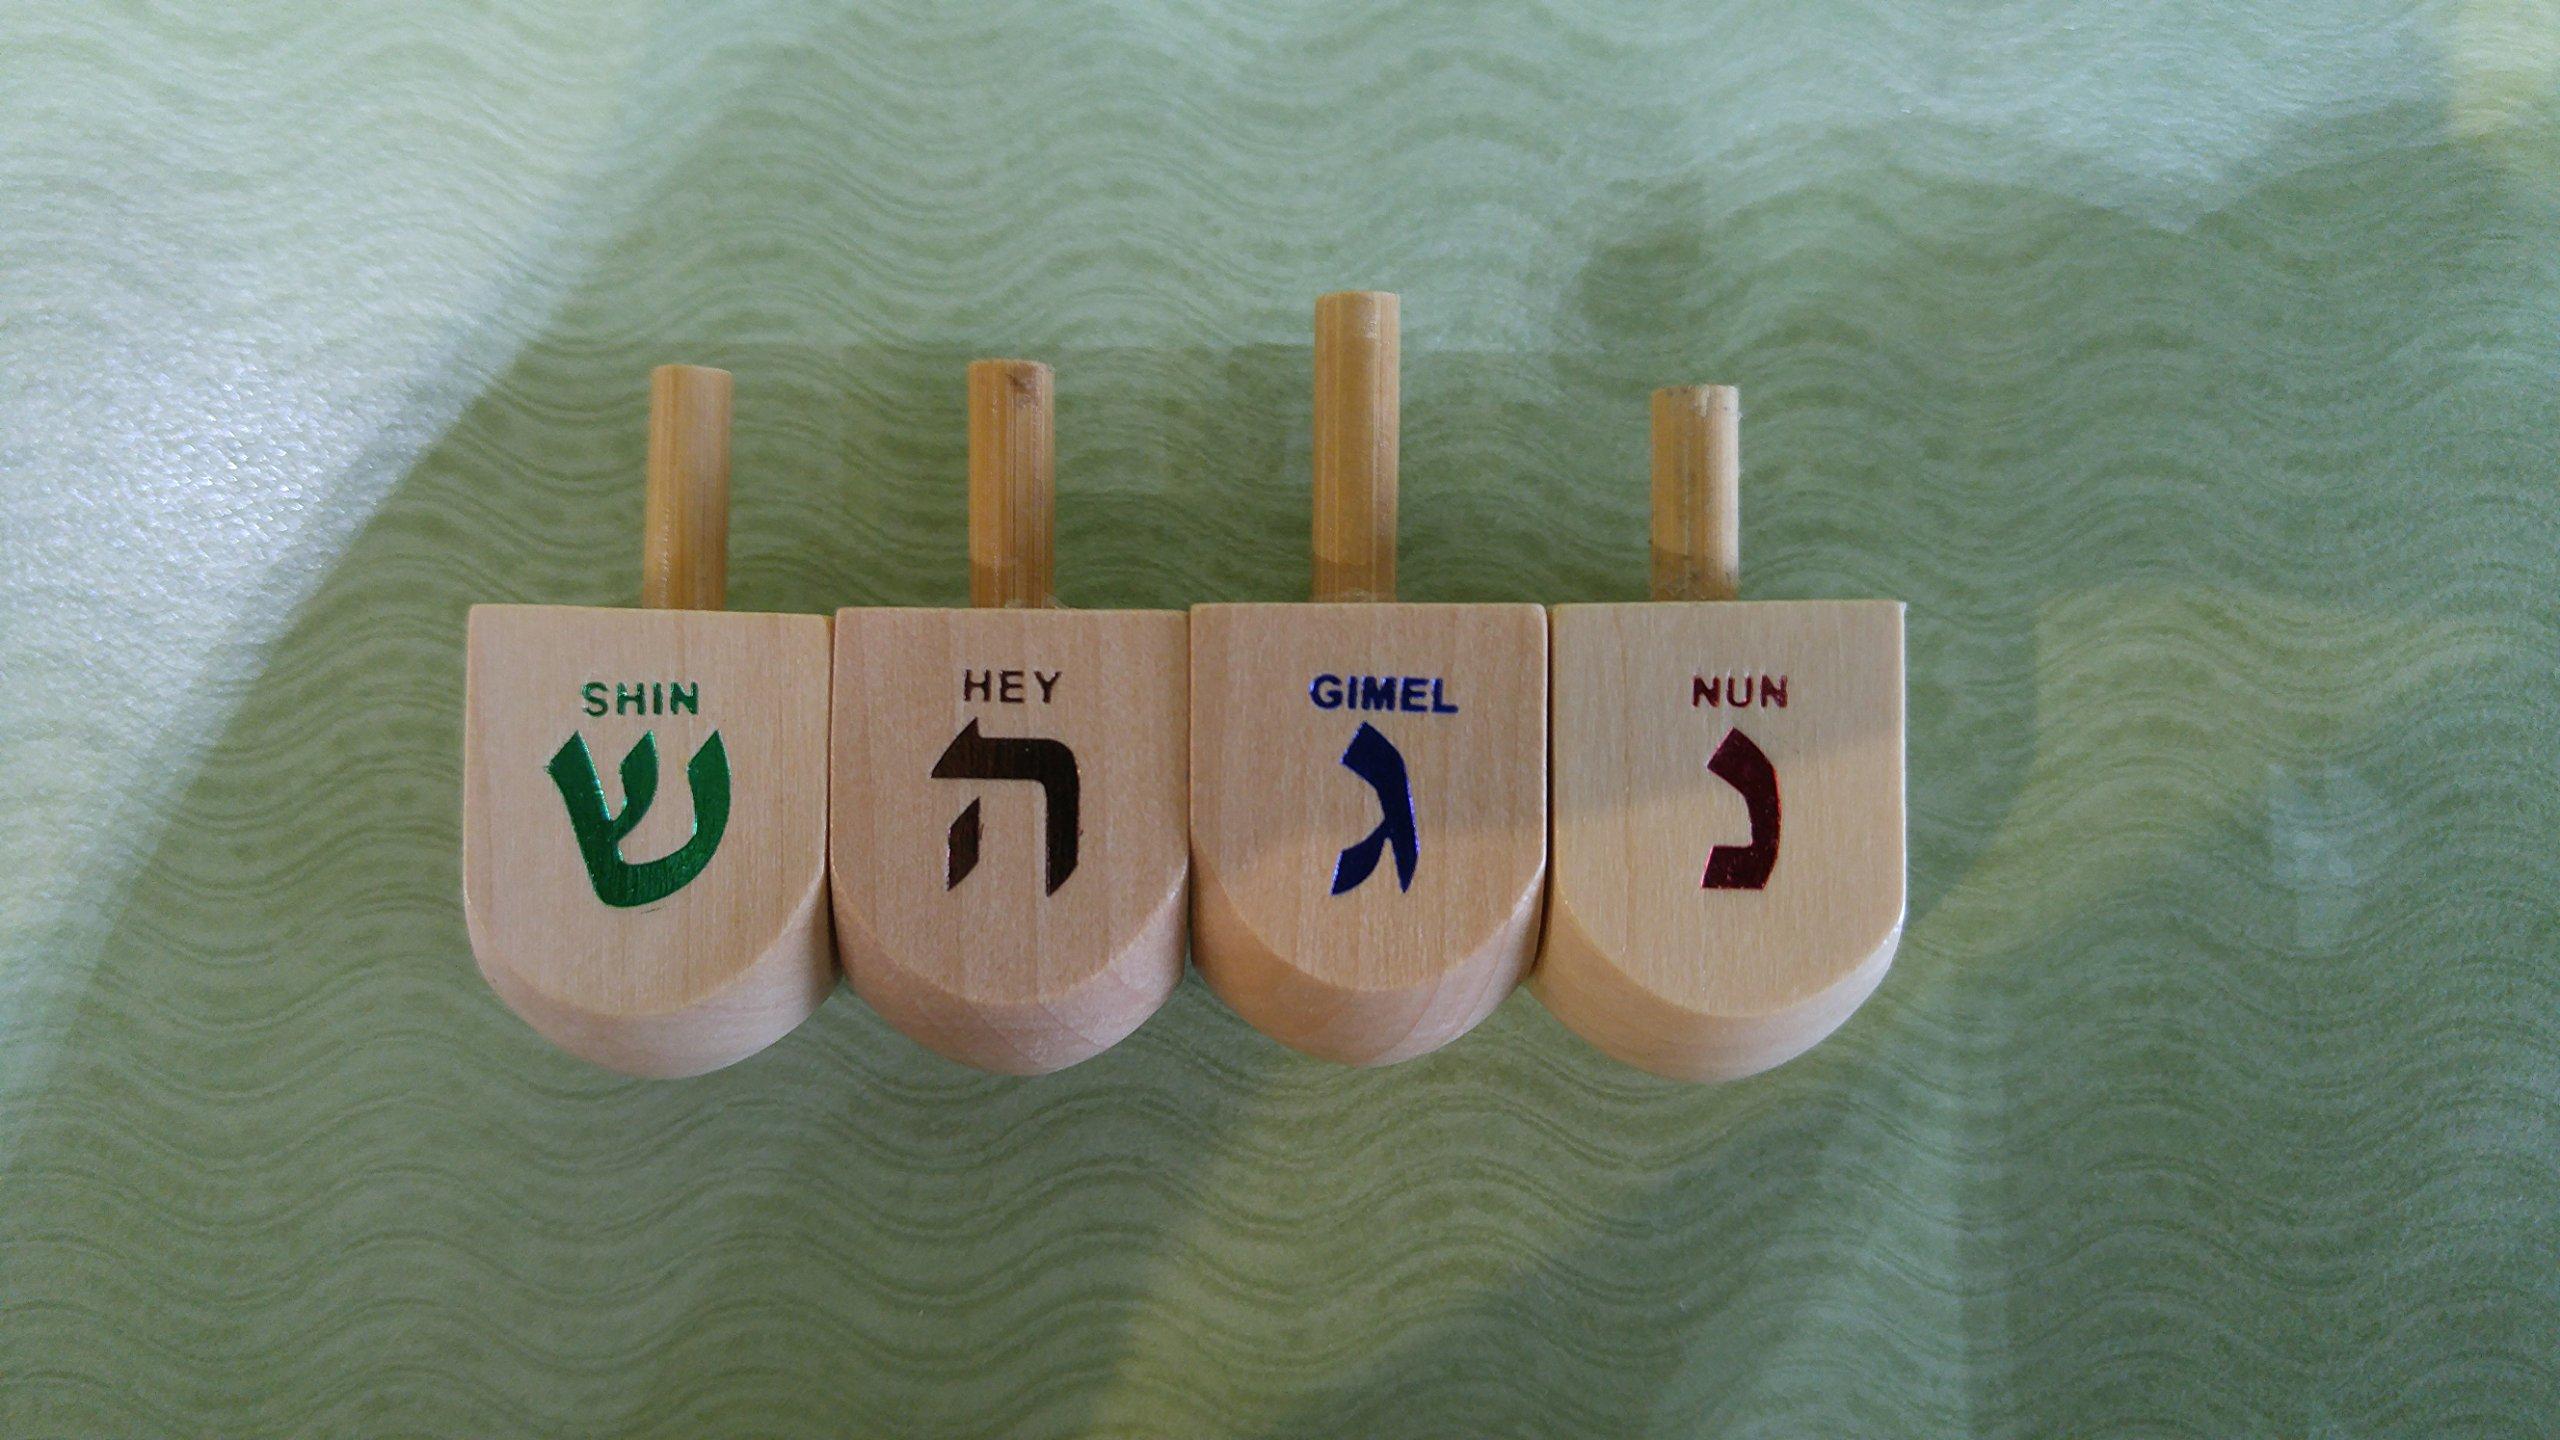 Jerusalem Dreidel Wood Dreidels Medium Sized With English translation in Bulk Pack of 100 Pieces in Zippered Bag